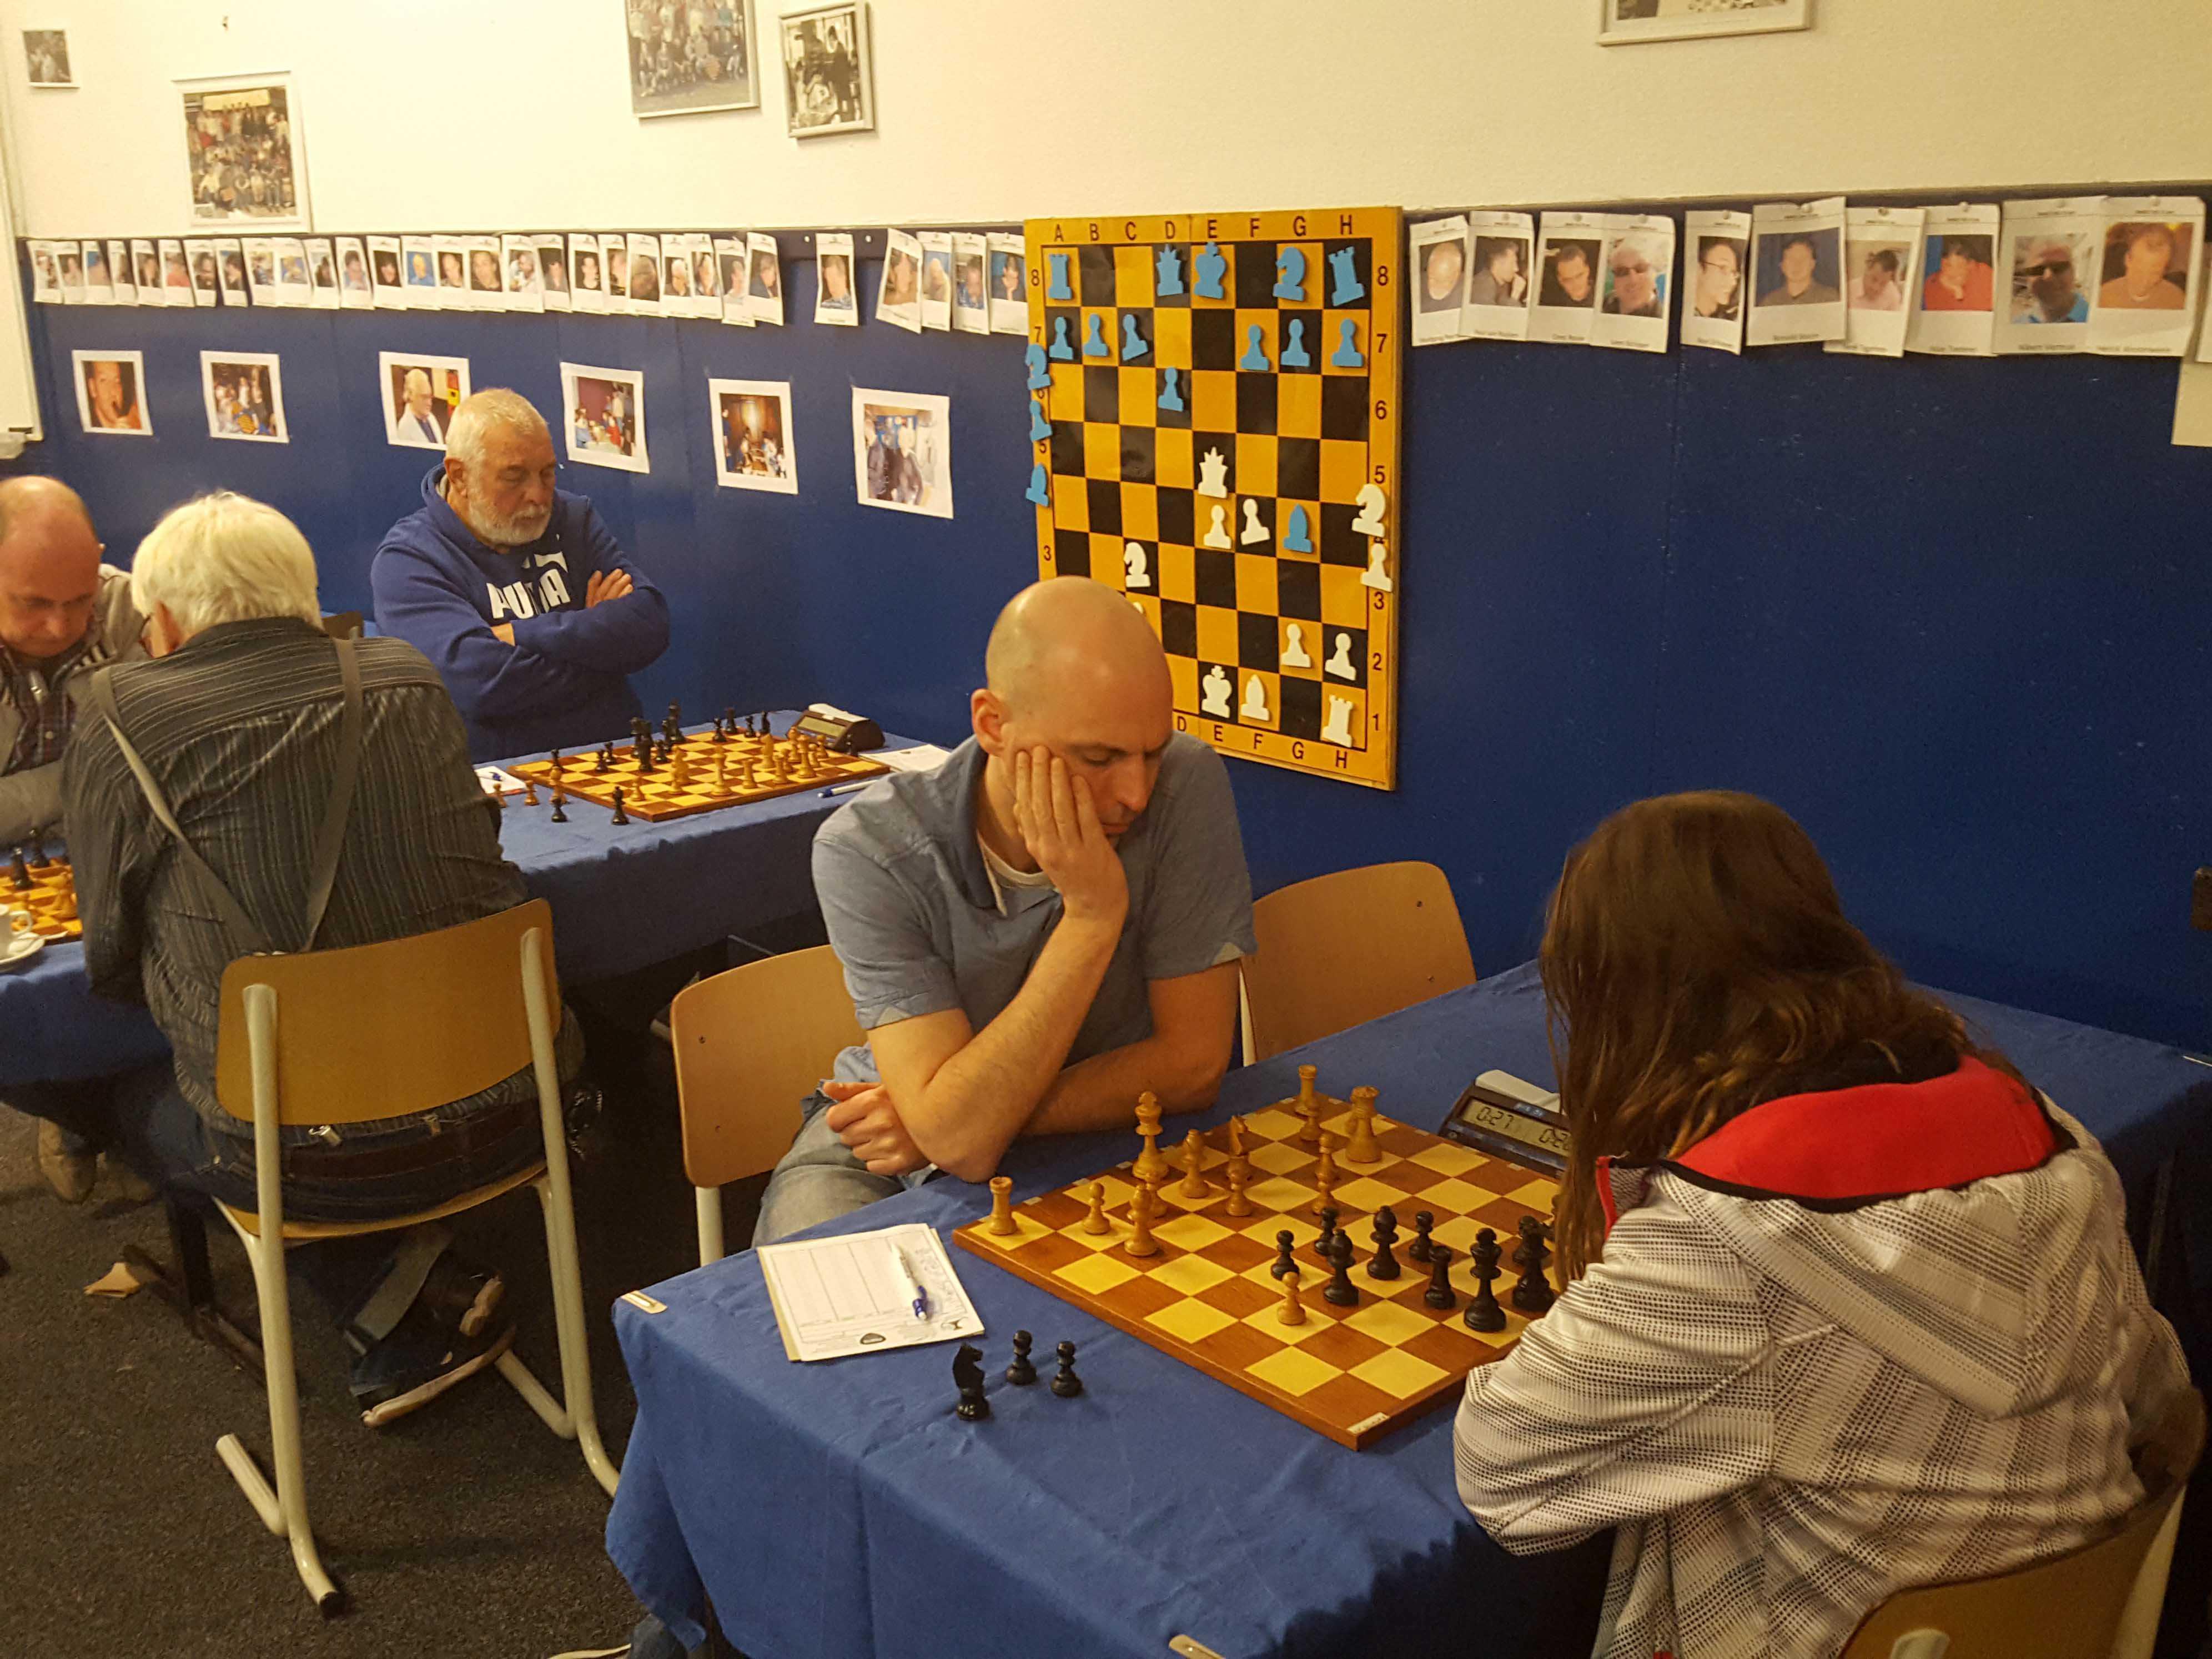 1617 Competitie10 03